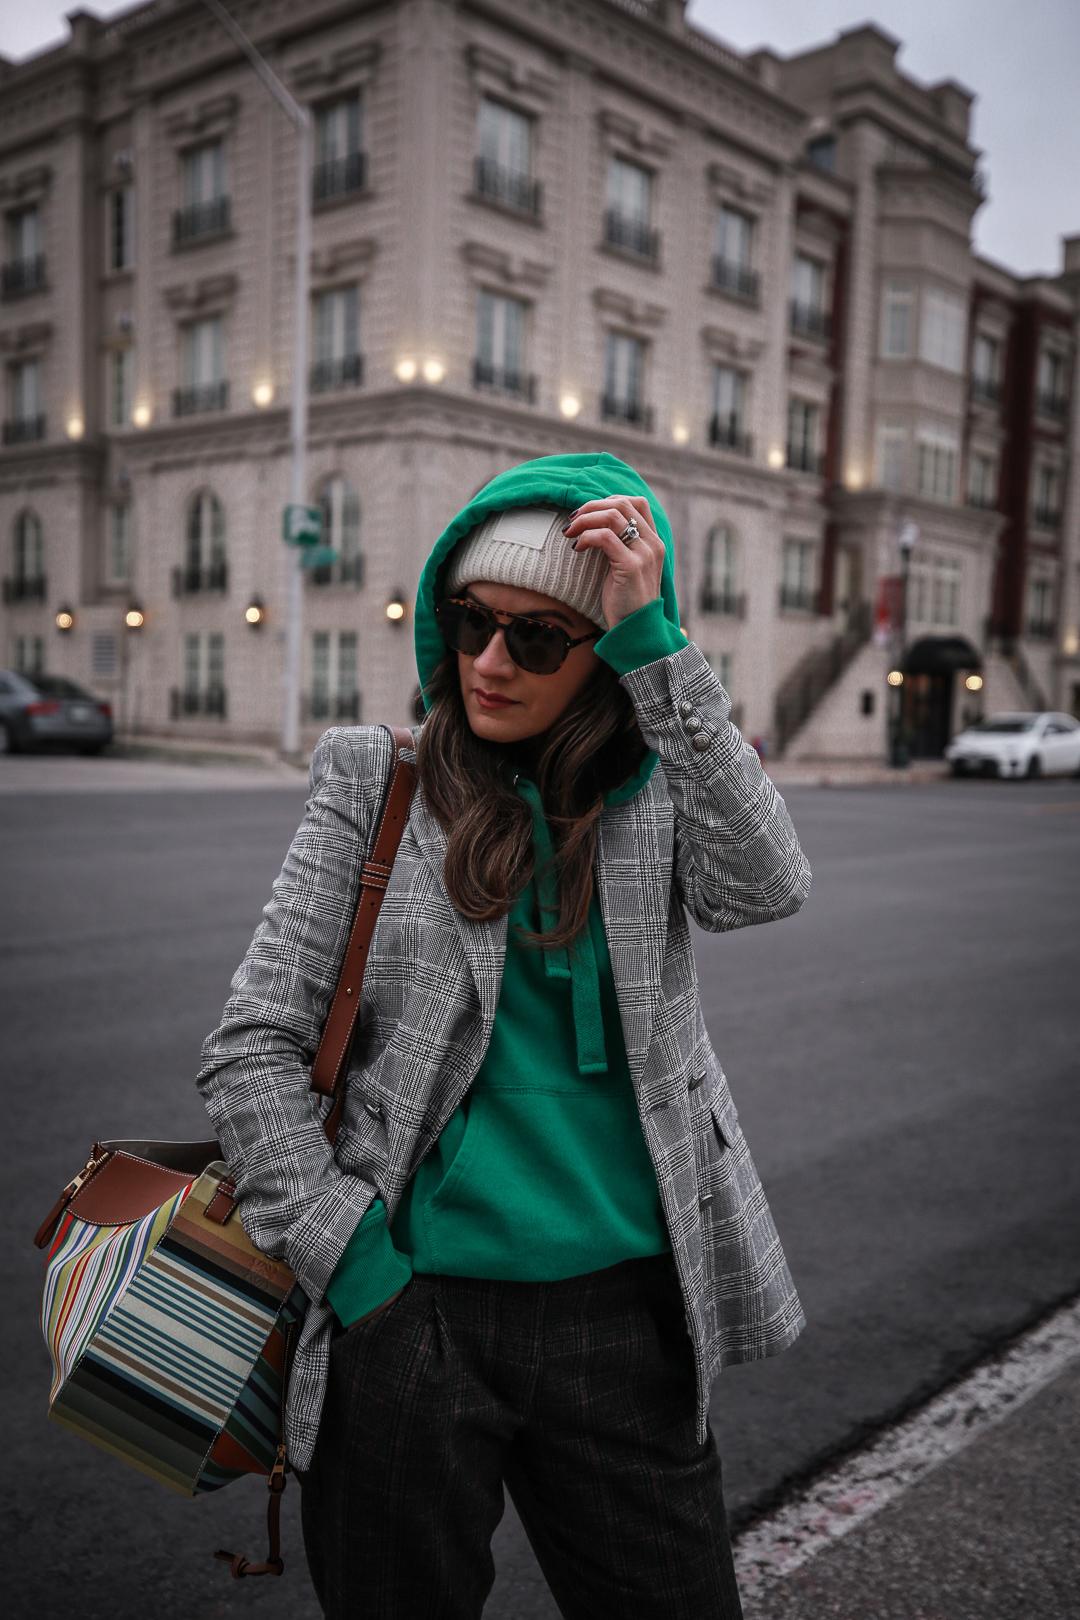 Nathalie Martin wearing plaid blazerk from Zara, green Isabel Marant hoodie, Aritzia wool Chambery pant, Doc Marten boots, striped Loewe hammock bag, Acne Studios ivory Pansy face beanie, woahstyle.com_4763.jpg